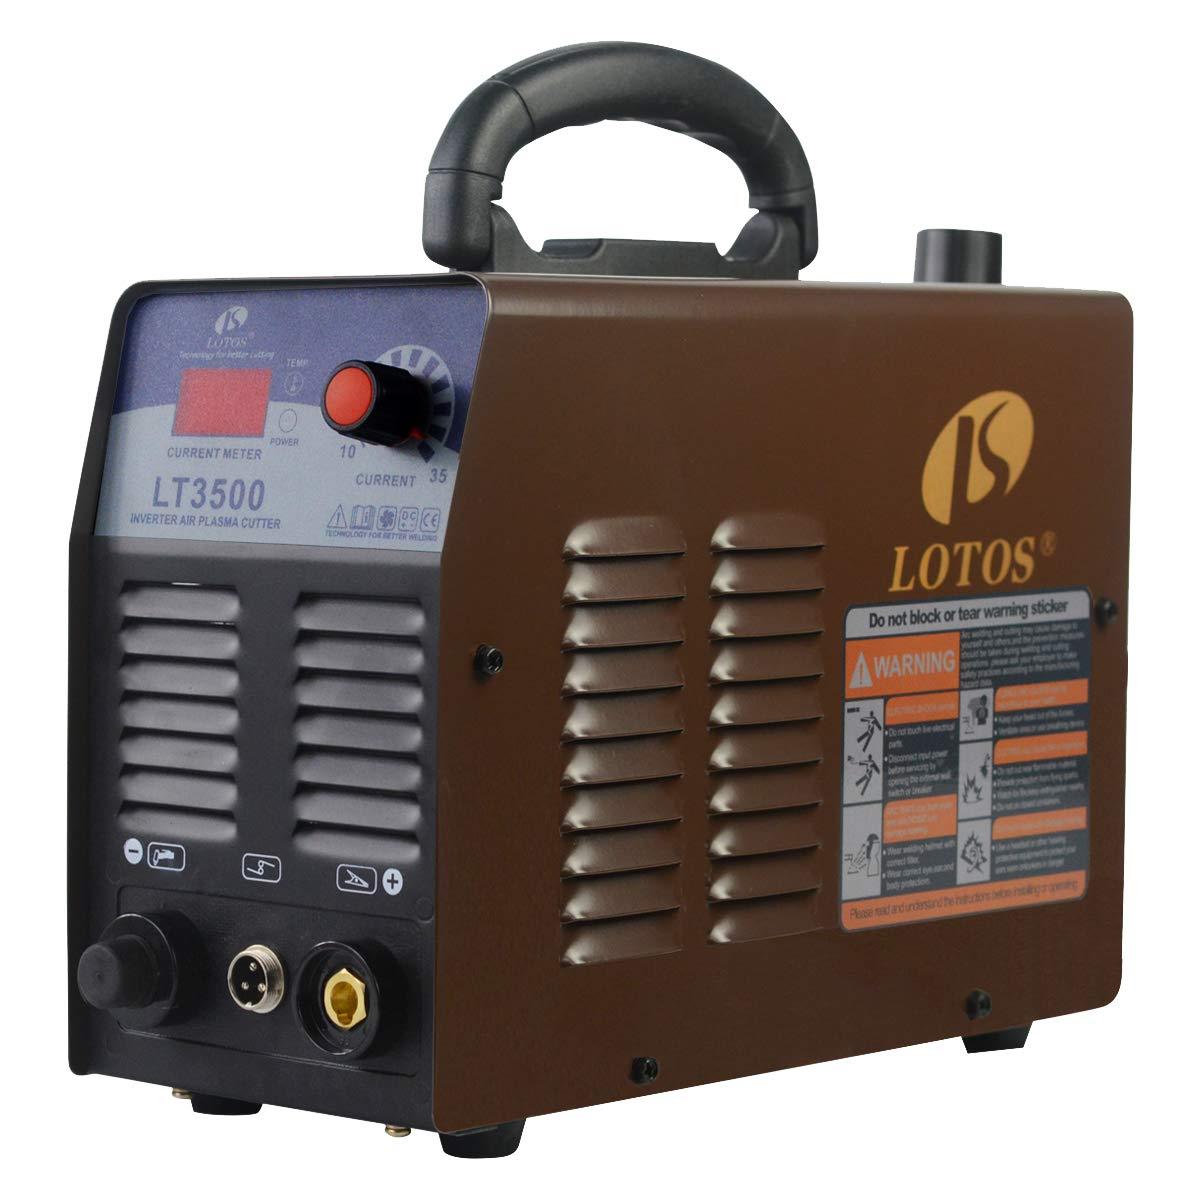 LOTOS LT3500 Plasma Cutter – Best for Compact Design